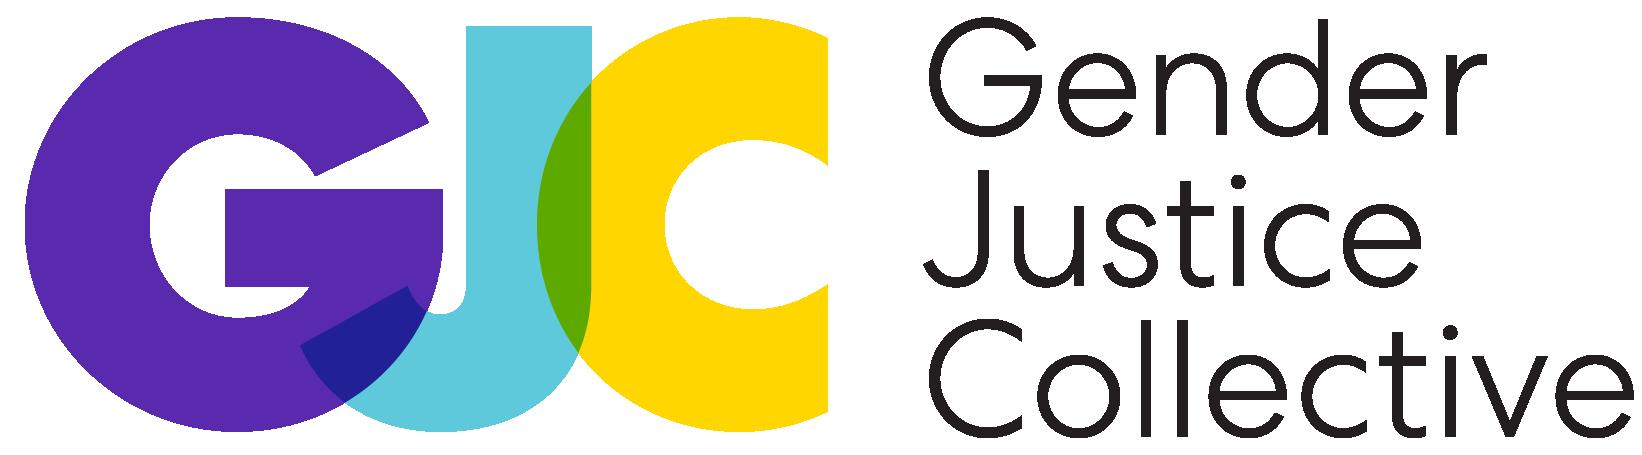 Gender Justice Collective